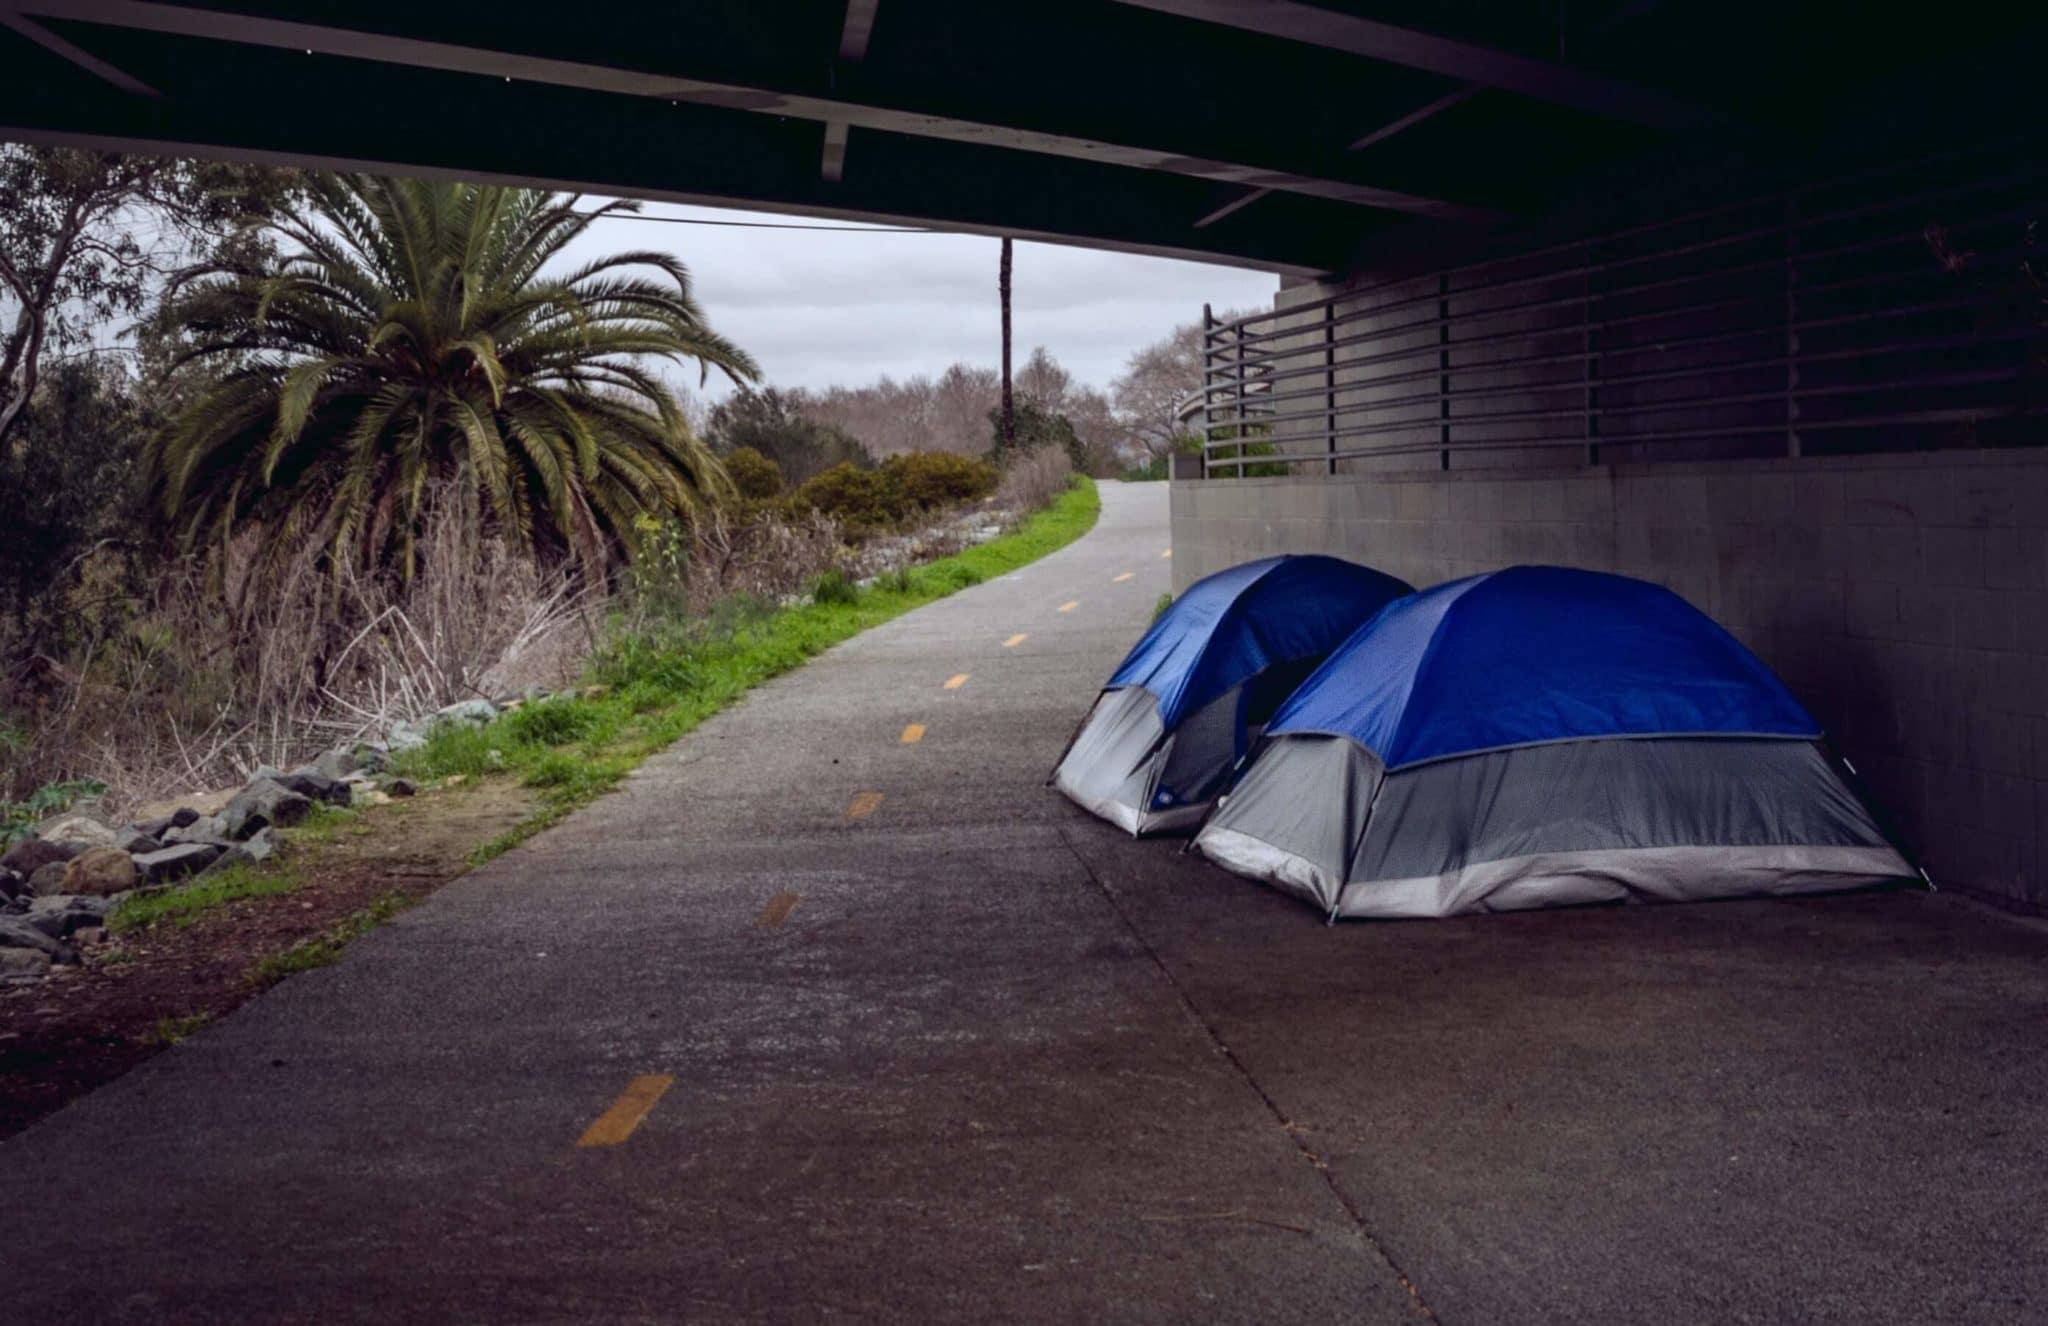 Tents of homeless people under bridge